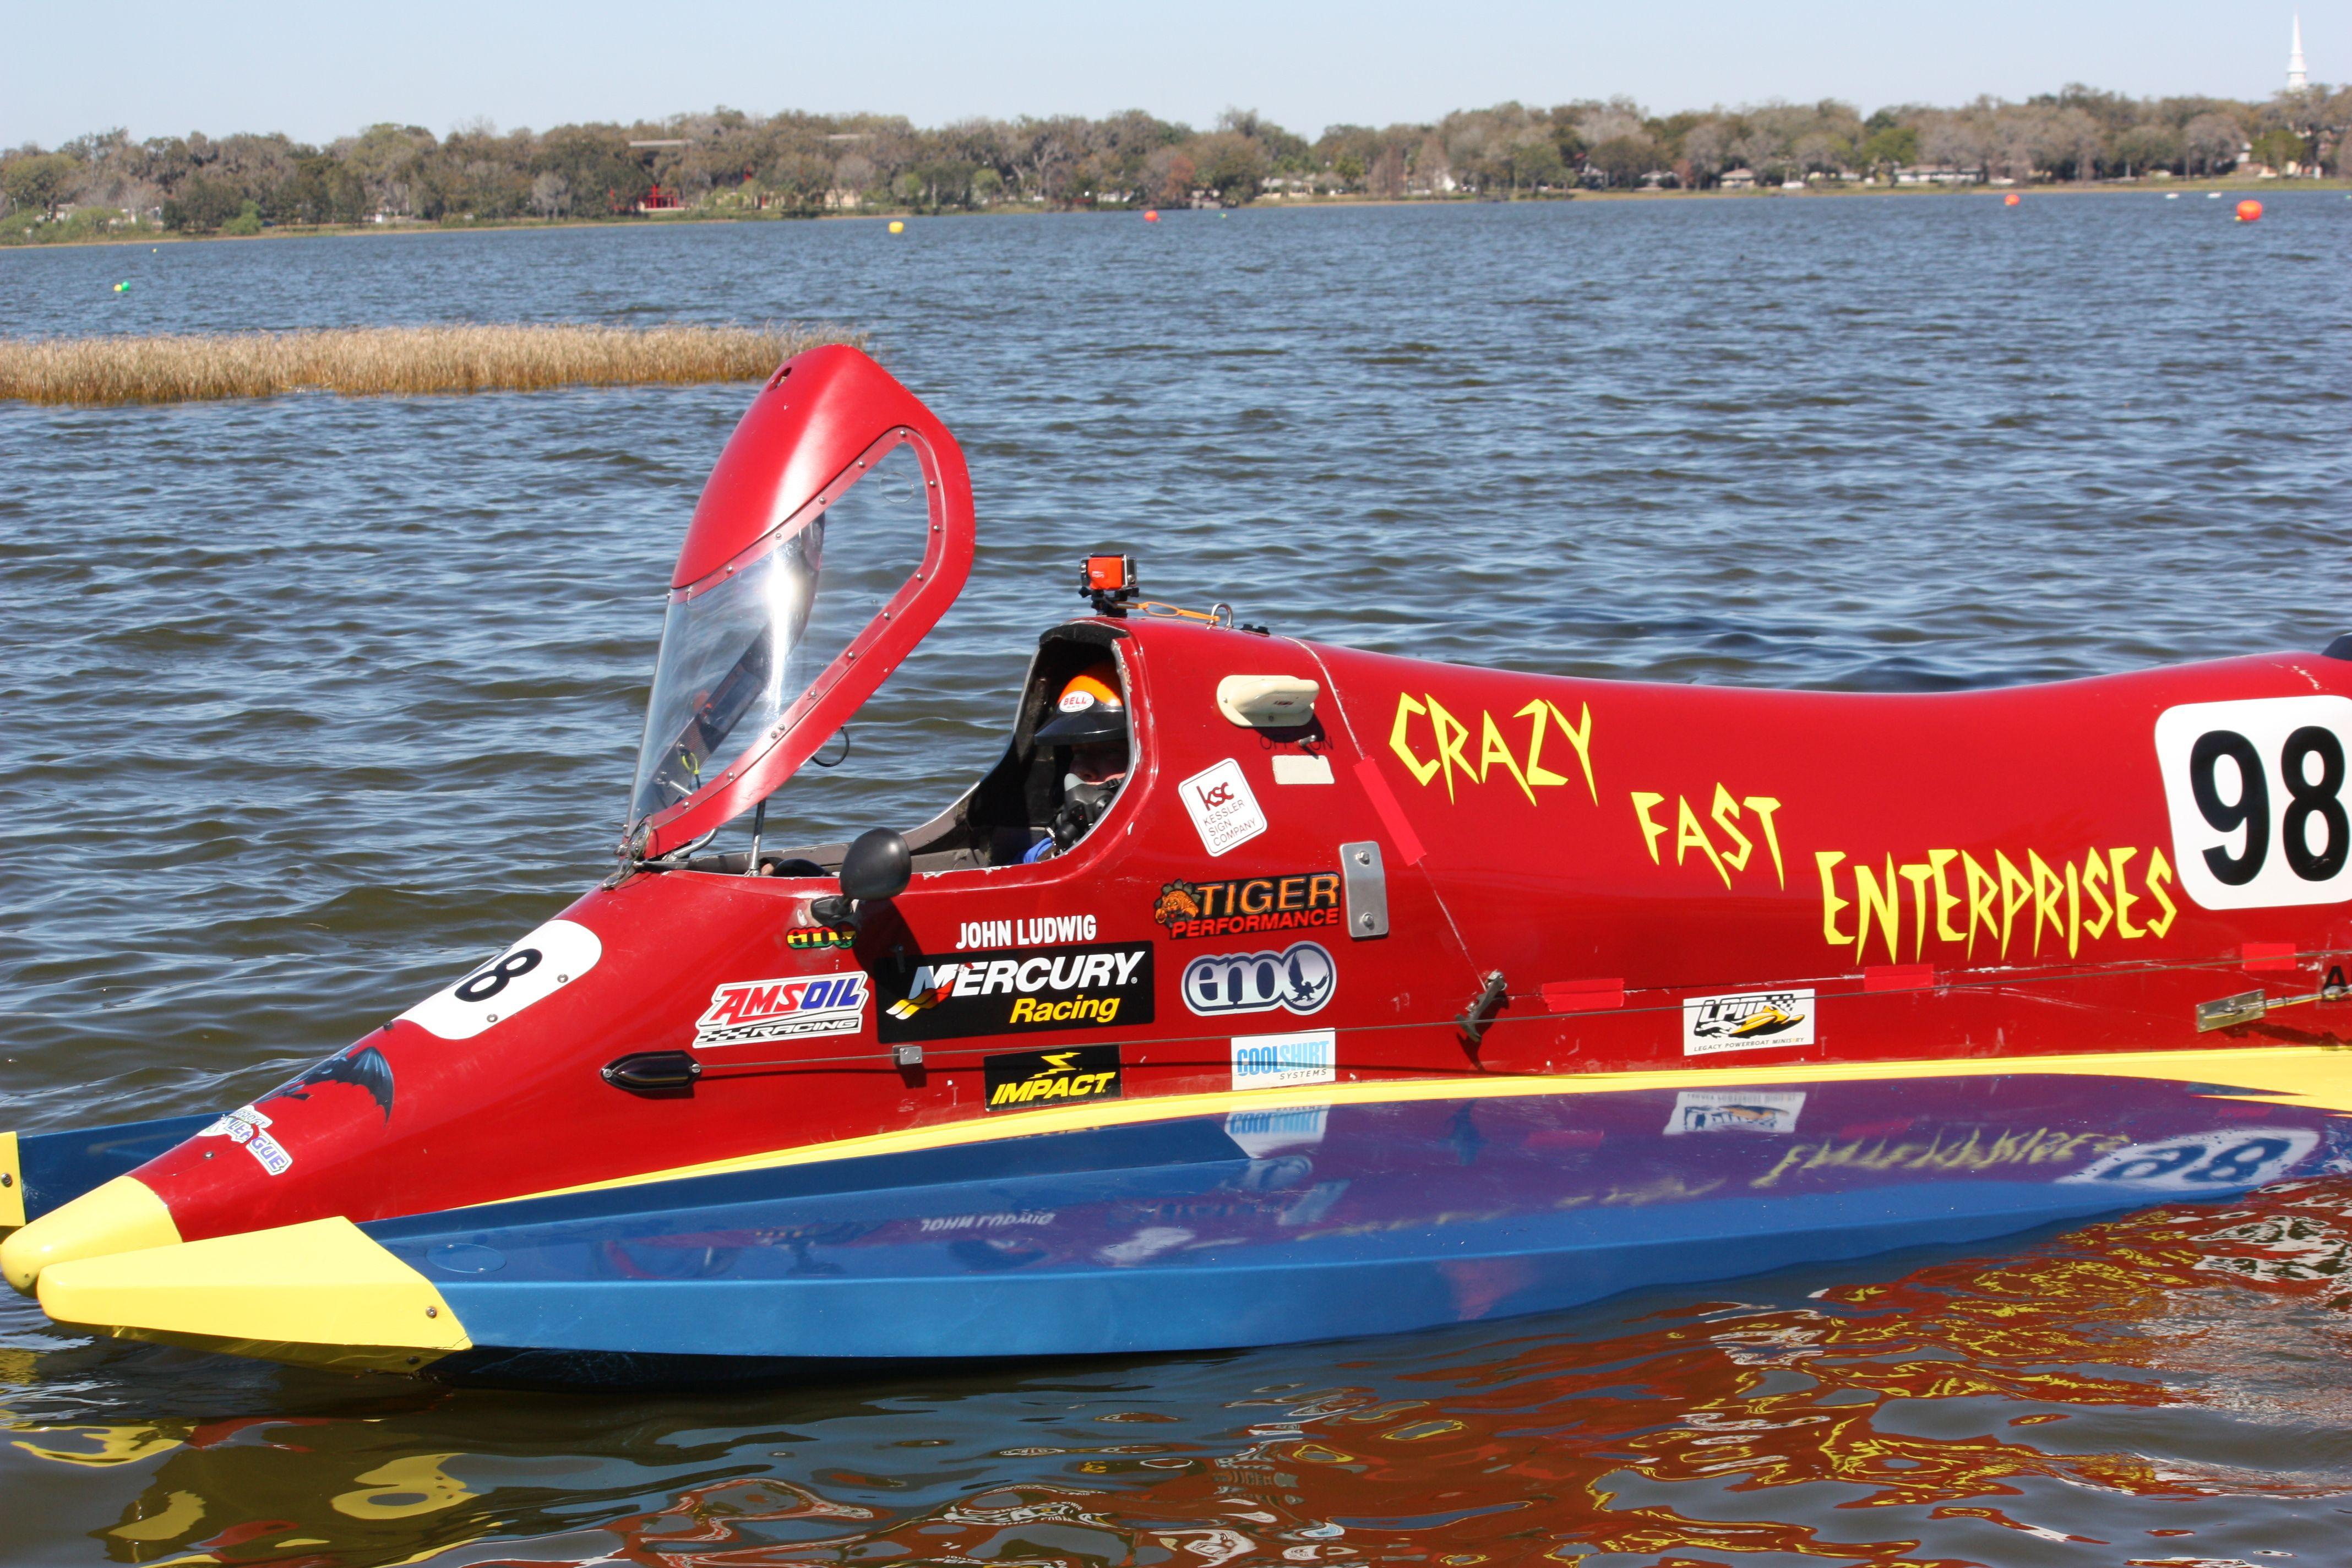 Crazy Fast Enterprises Formula 2 race boat driver John